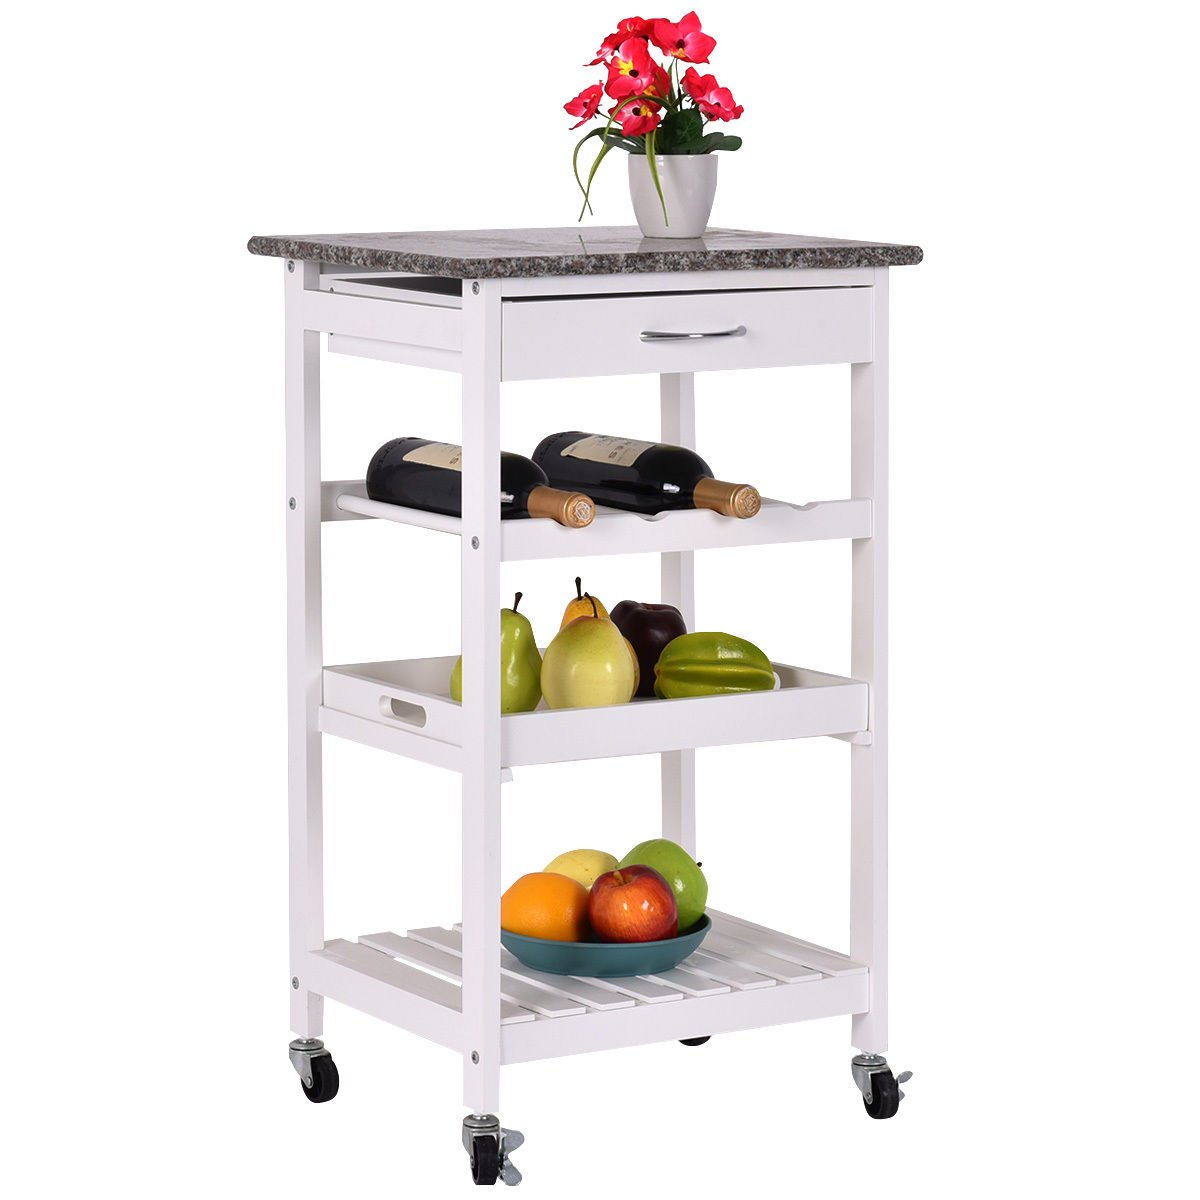 4-Tier Rolling Wood Kitchen Trolley Island Cart Storage Shelf Drawer Wine Rack White New